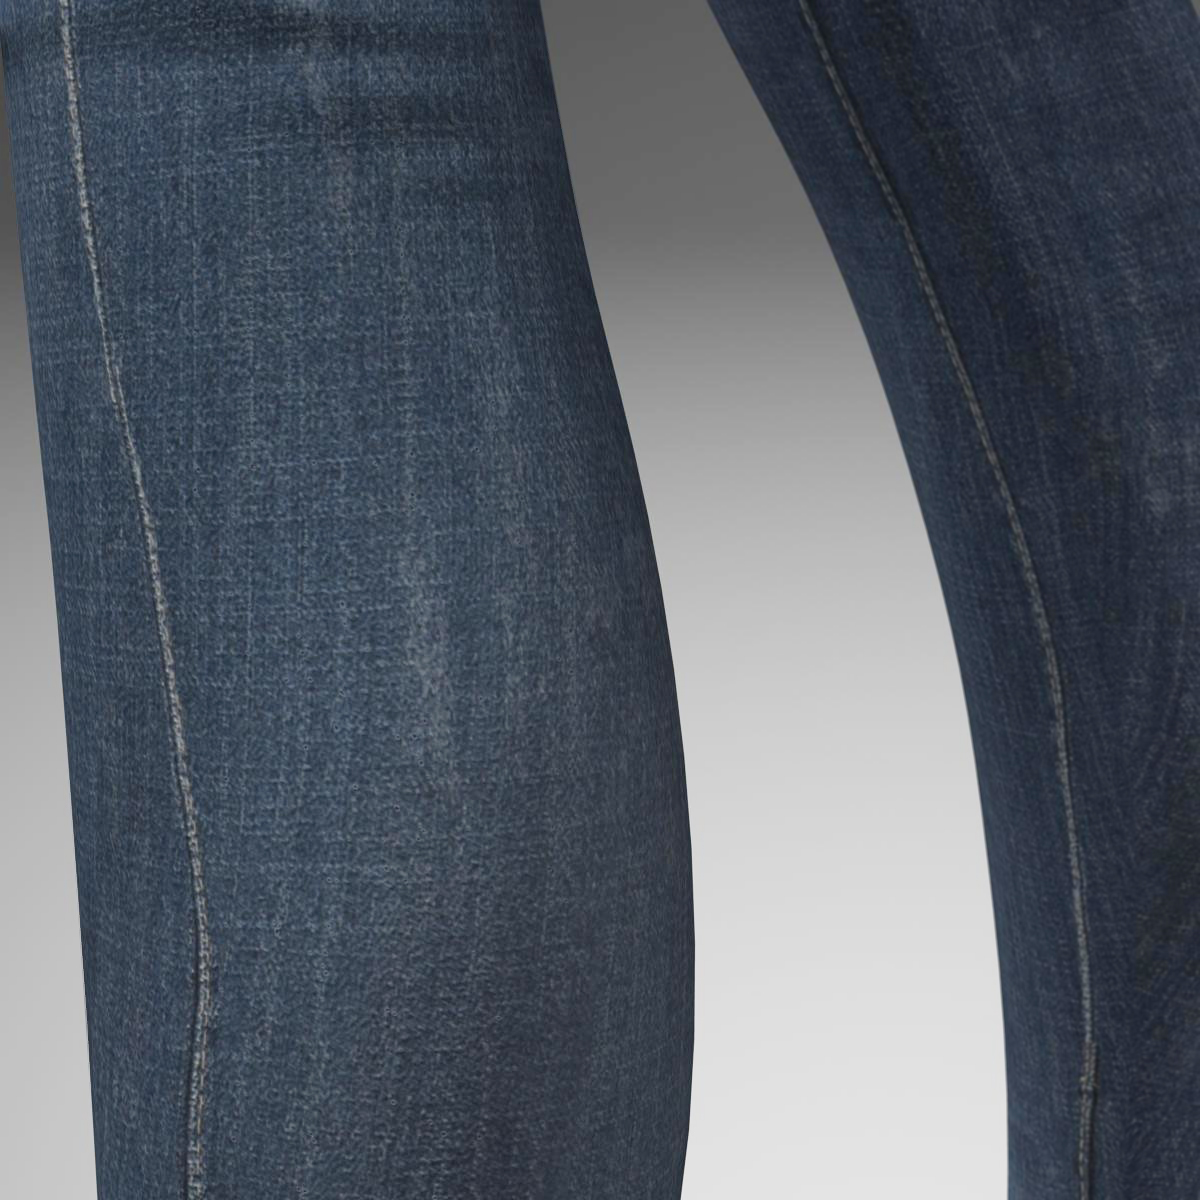 female jeans 3d model 3ds max fbx c4d ma mb obj 160410